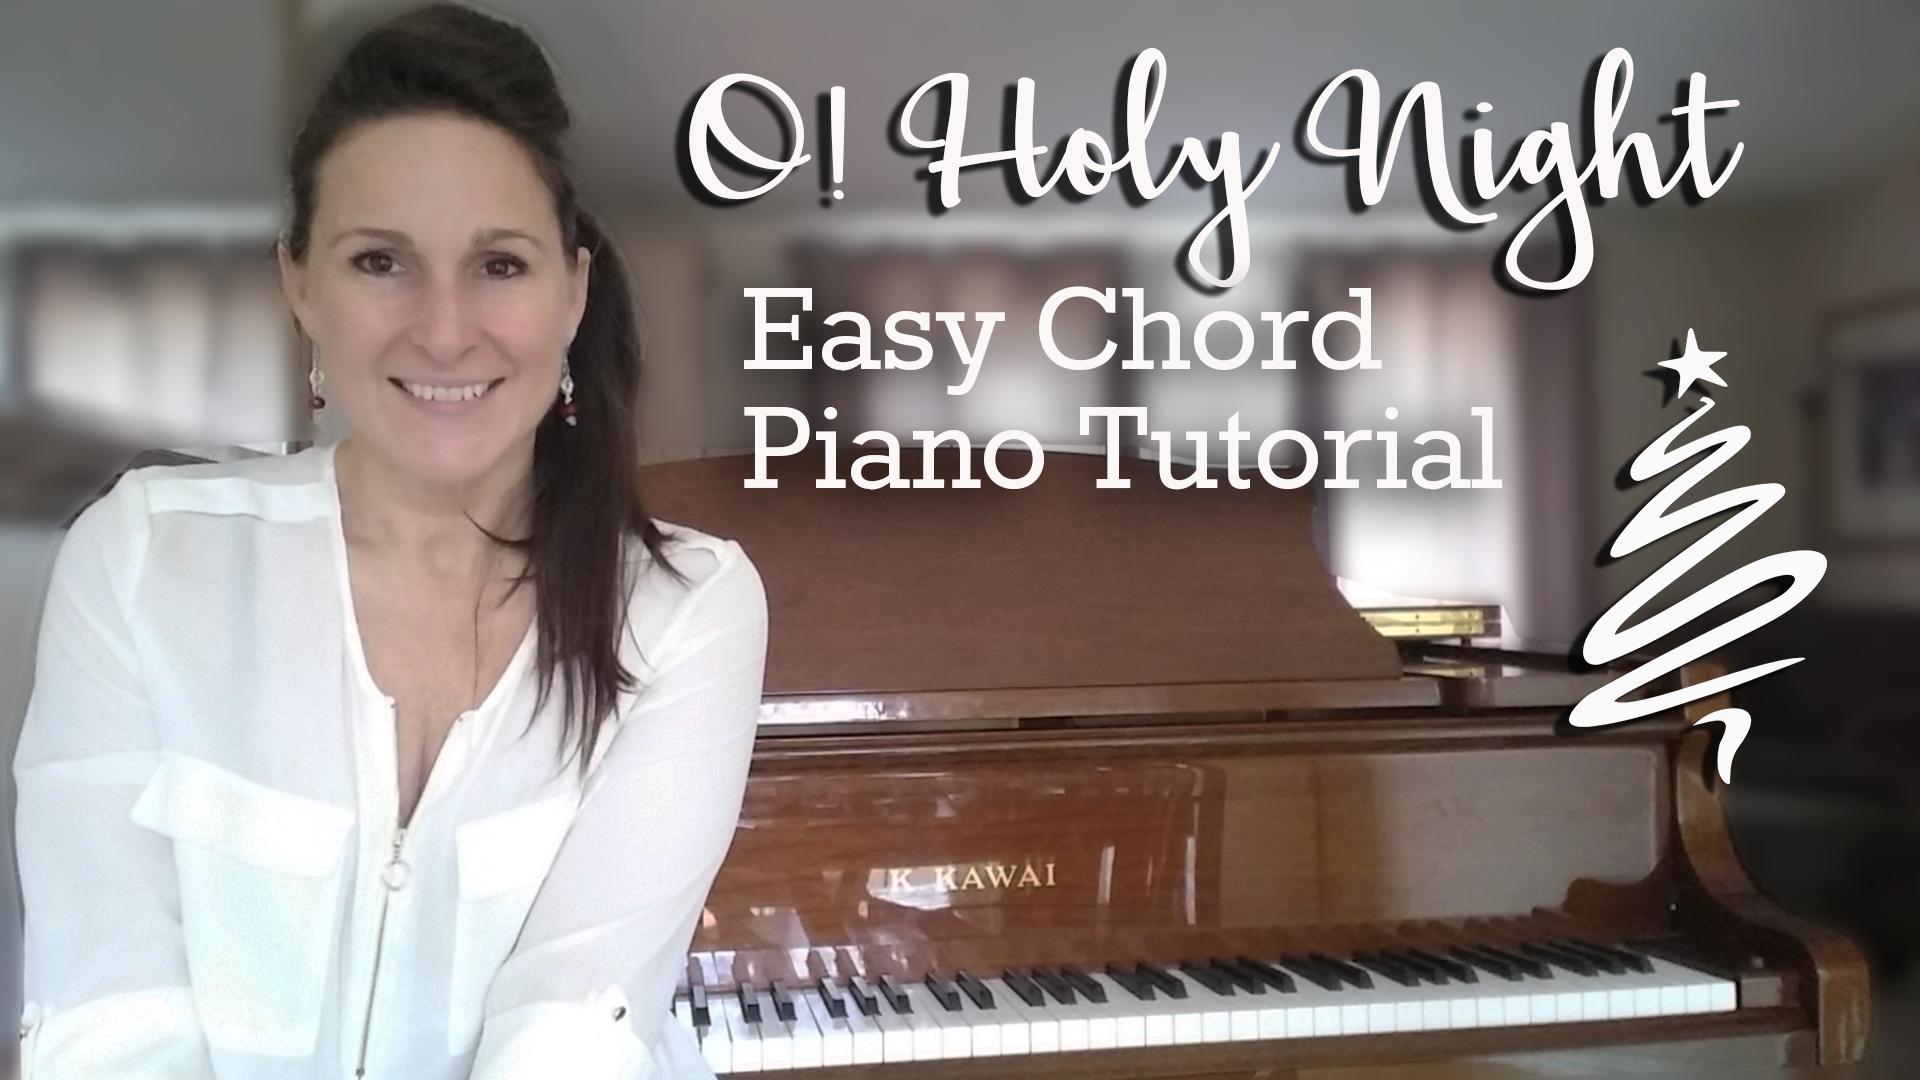 O holy night easy chord piano tutorial piano video lessons courses o holy night easy chord piano tutorial hexwebz Gallery